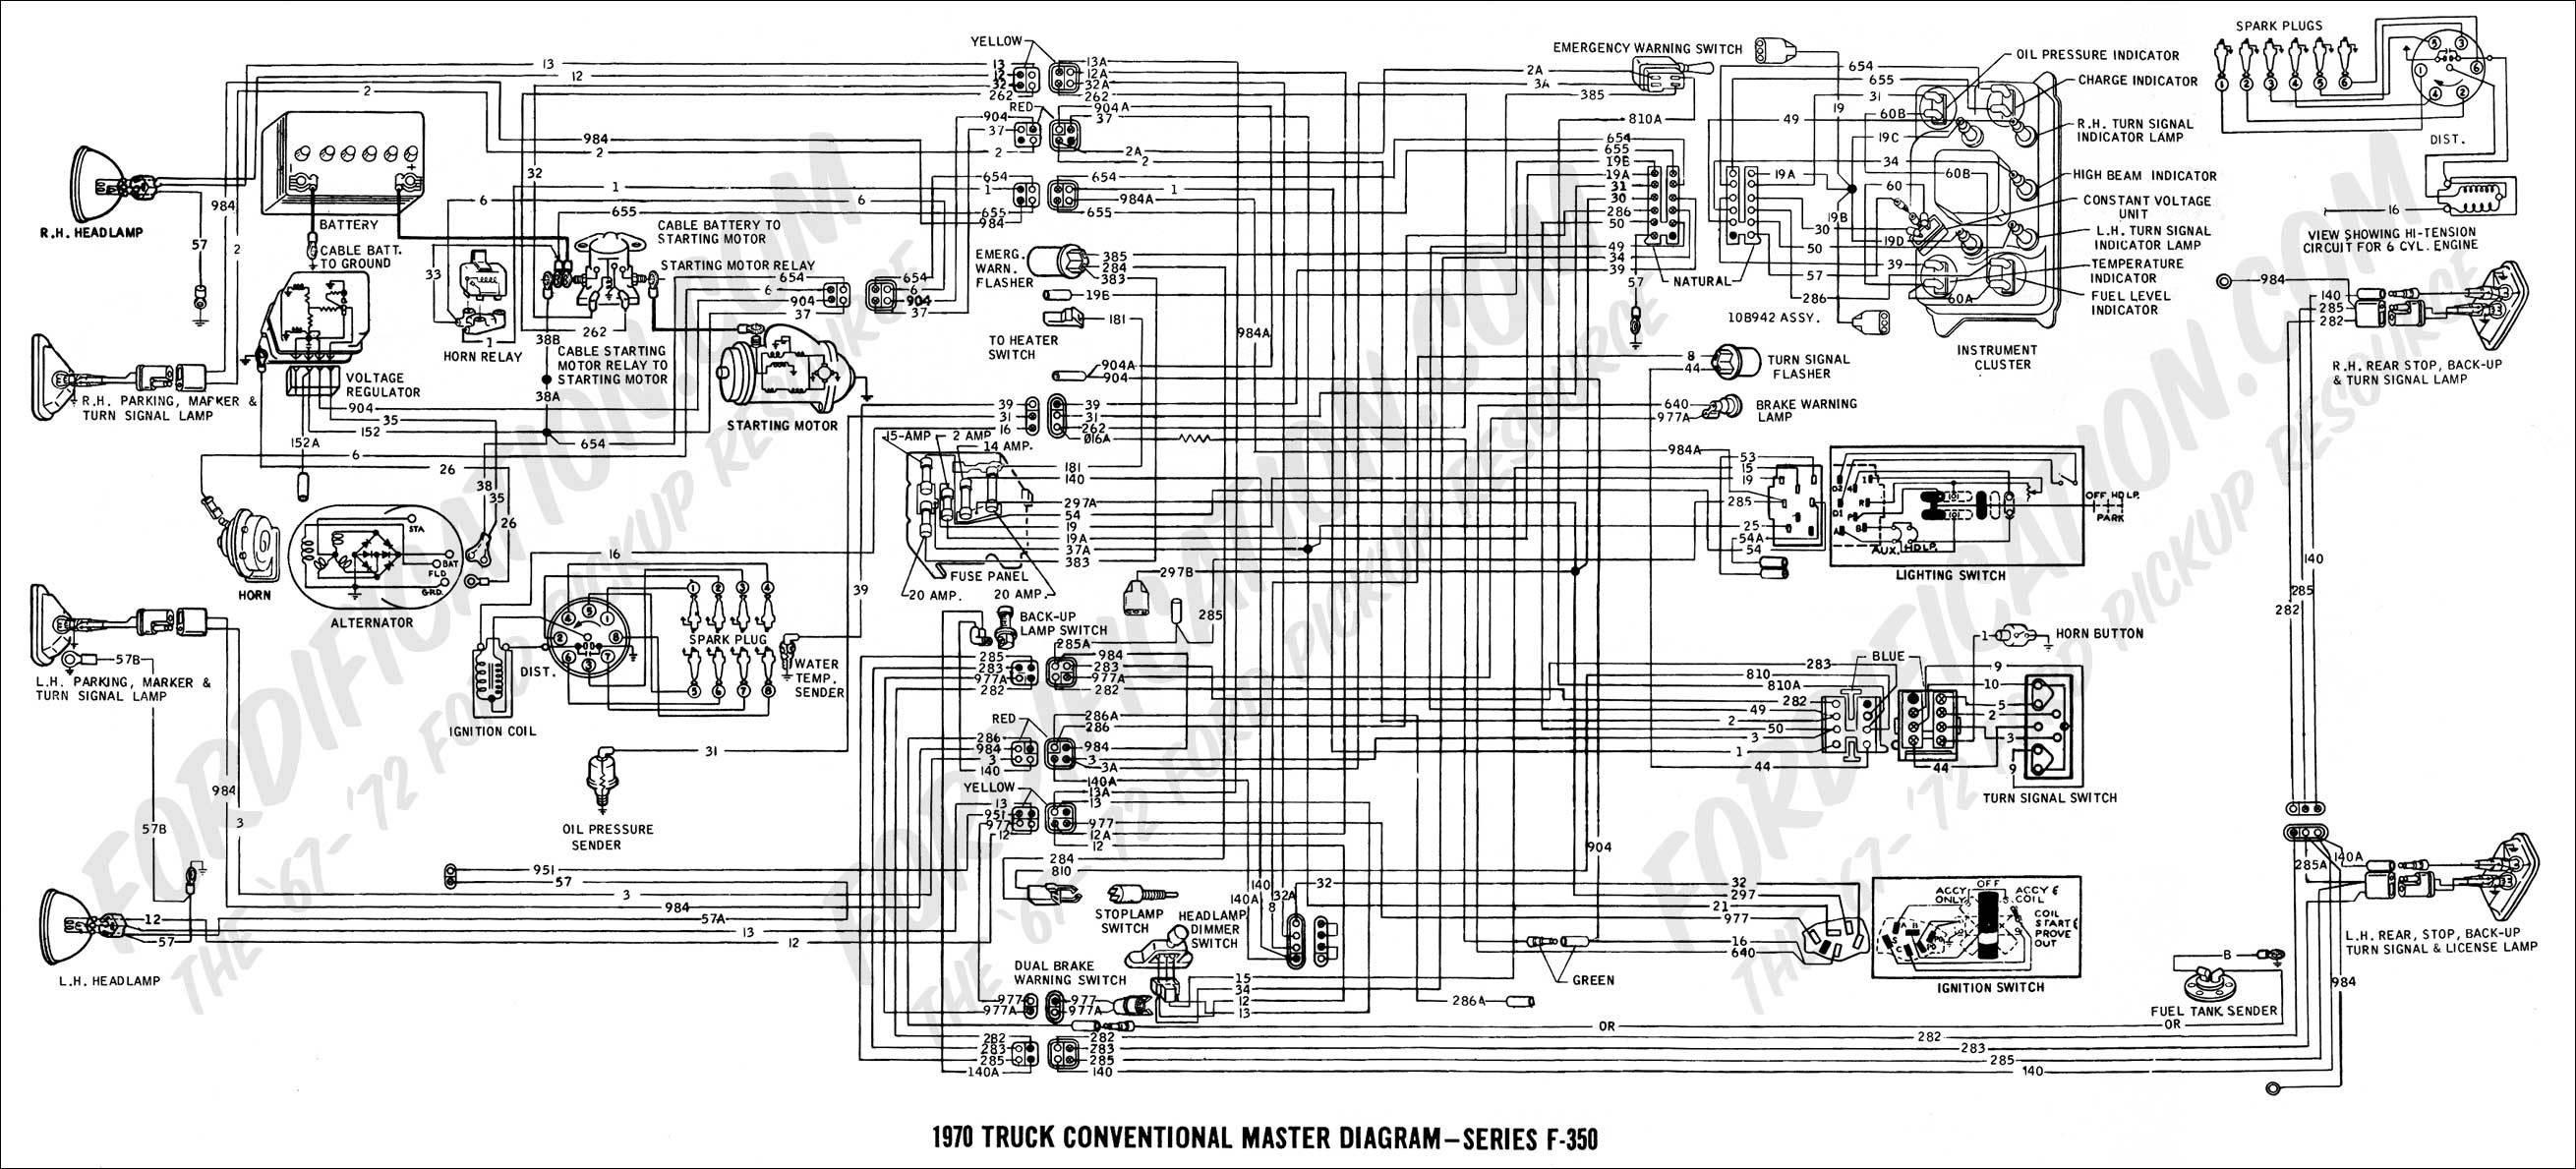 2006 Jeep Grand Cherokee Engine Diagram Sterling Truck Wiring Diagrams 1999 Jeep Grand Cherokee Engine Of 2006 Jeep Grand Cherokee Engine Diagram